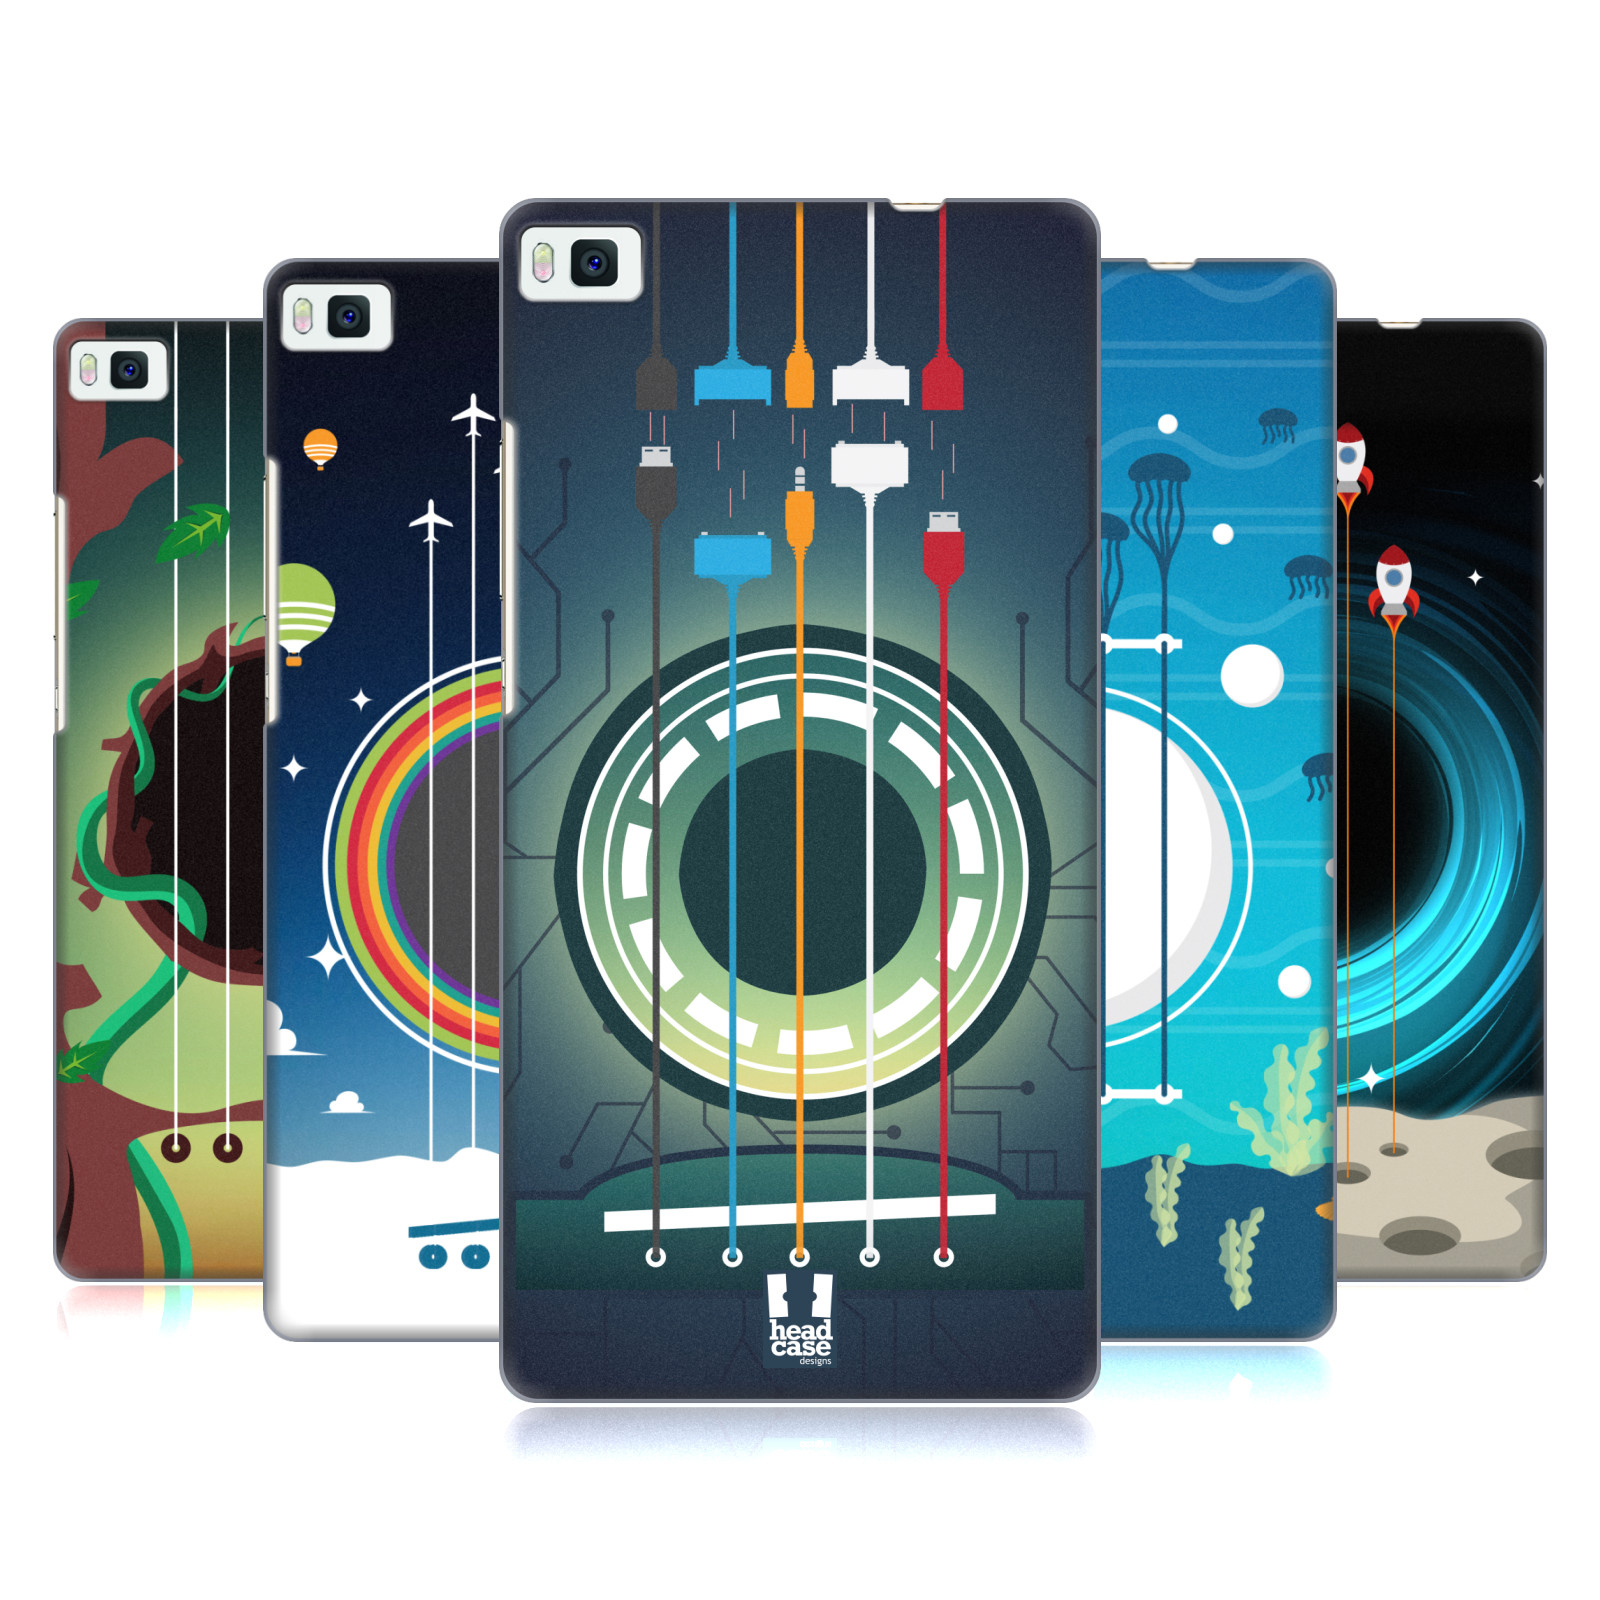 HEAD-CASE-DESIGNS-STRINGS-HARD-BACK-CASE-FOR-HUAWEI-PHONES-1